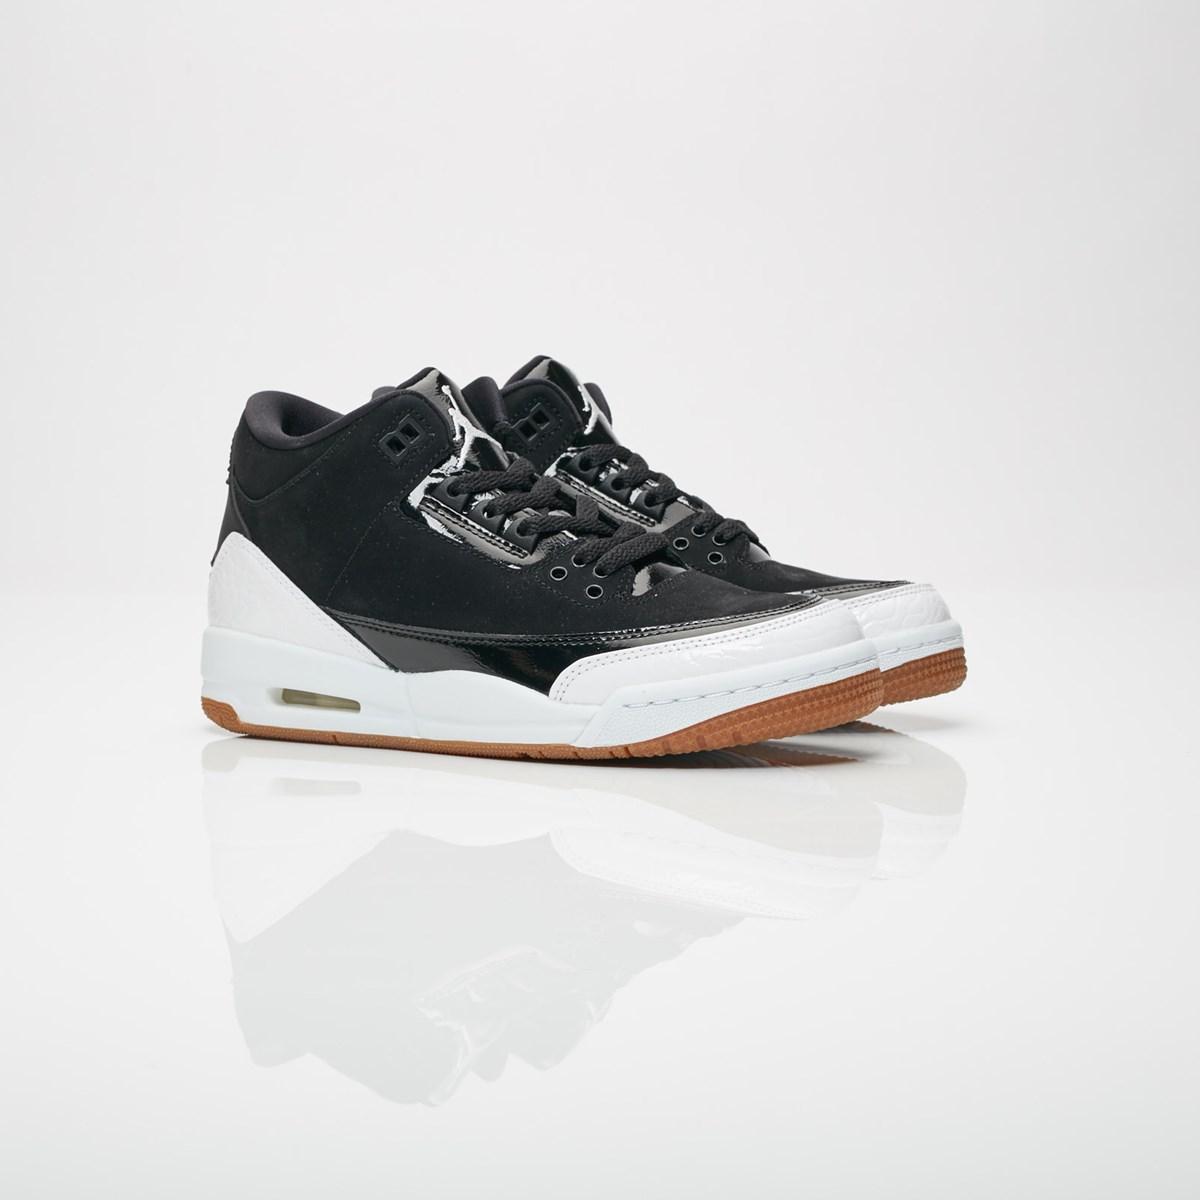 on sale 8fc44 de1f6 jordan brand air 3 retro gs 441140 022 sneakers   streetwear på nätet sen  199